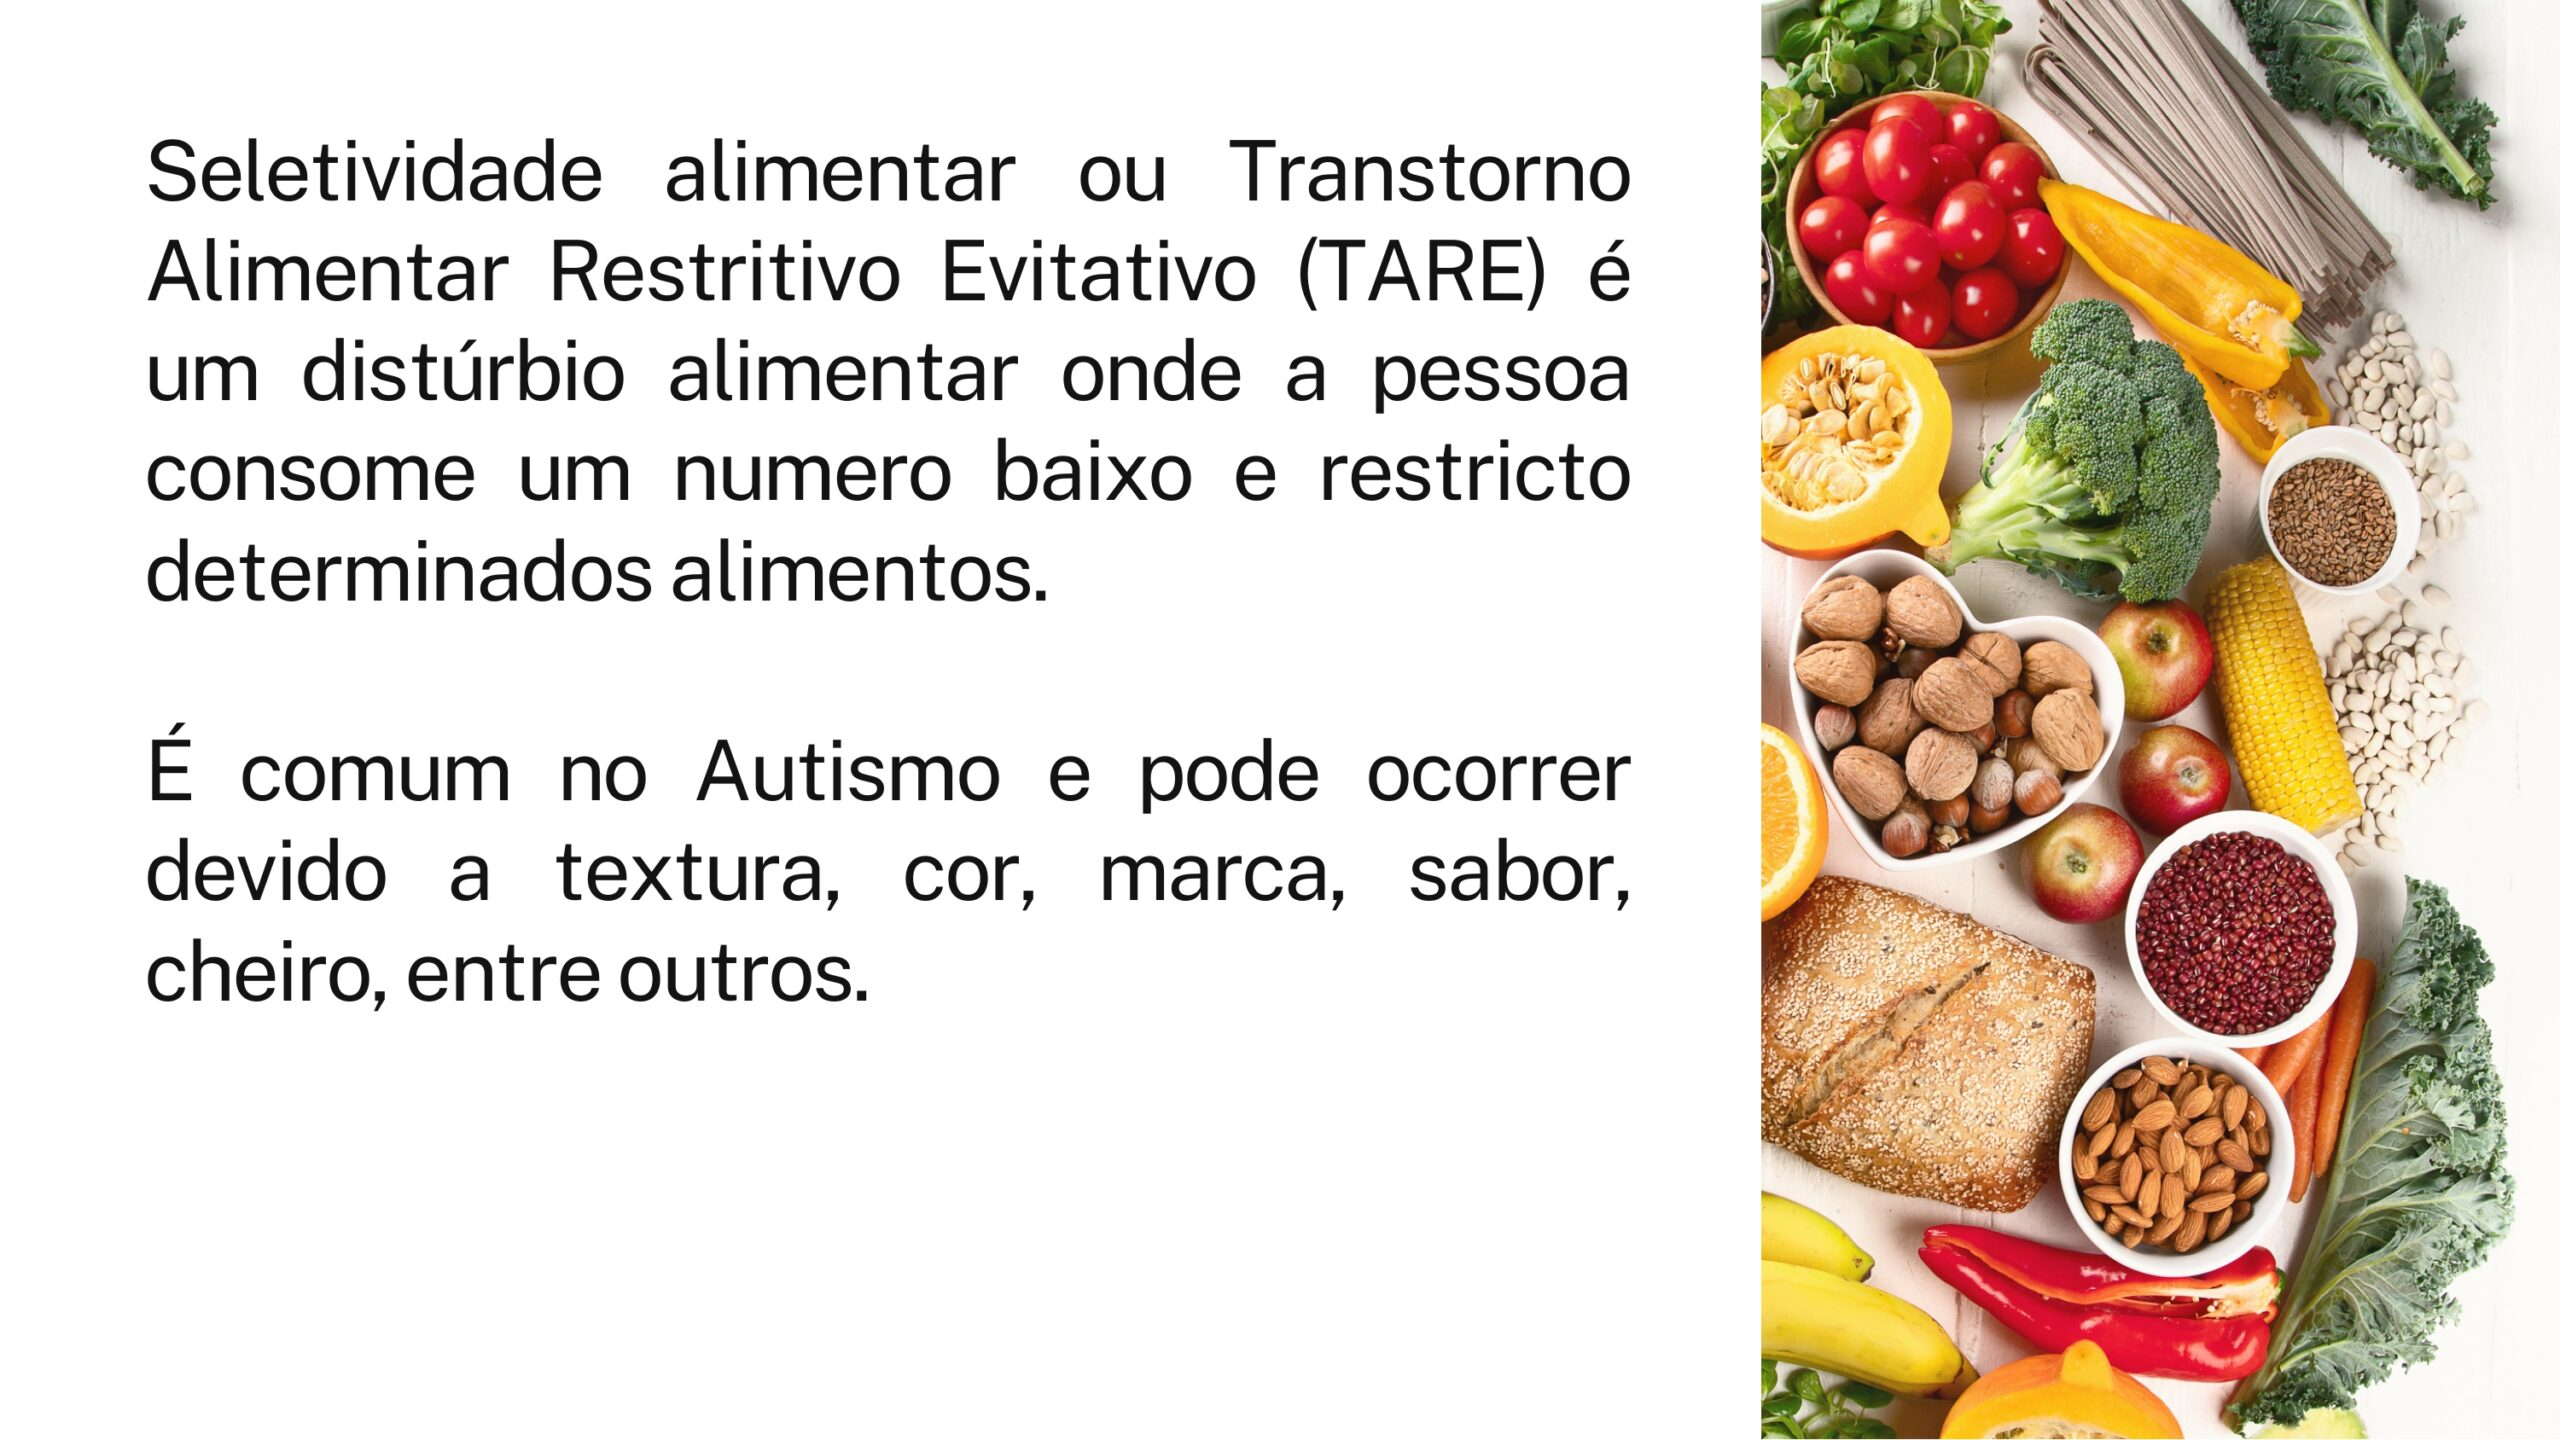 Seletividade alimentar no Autismo (1)_page-0003